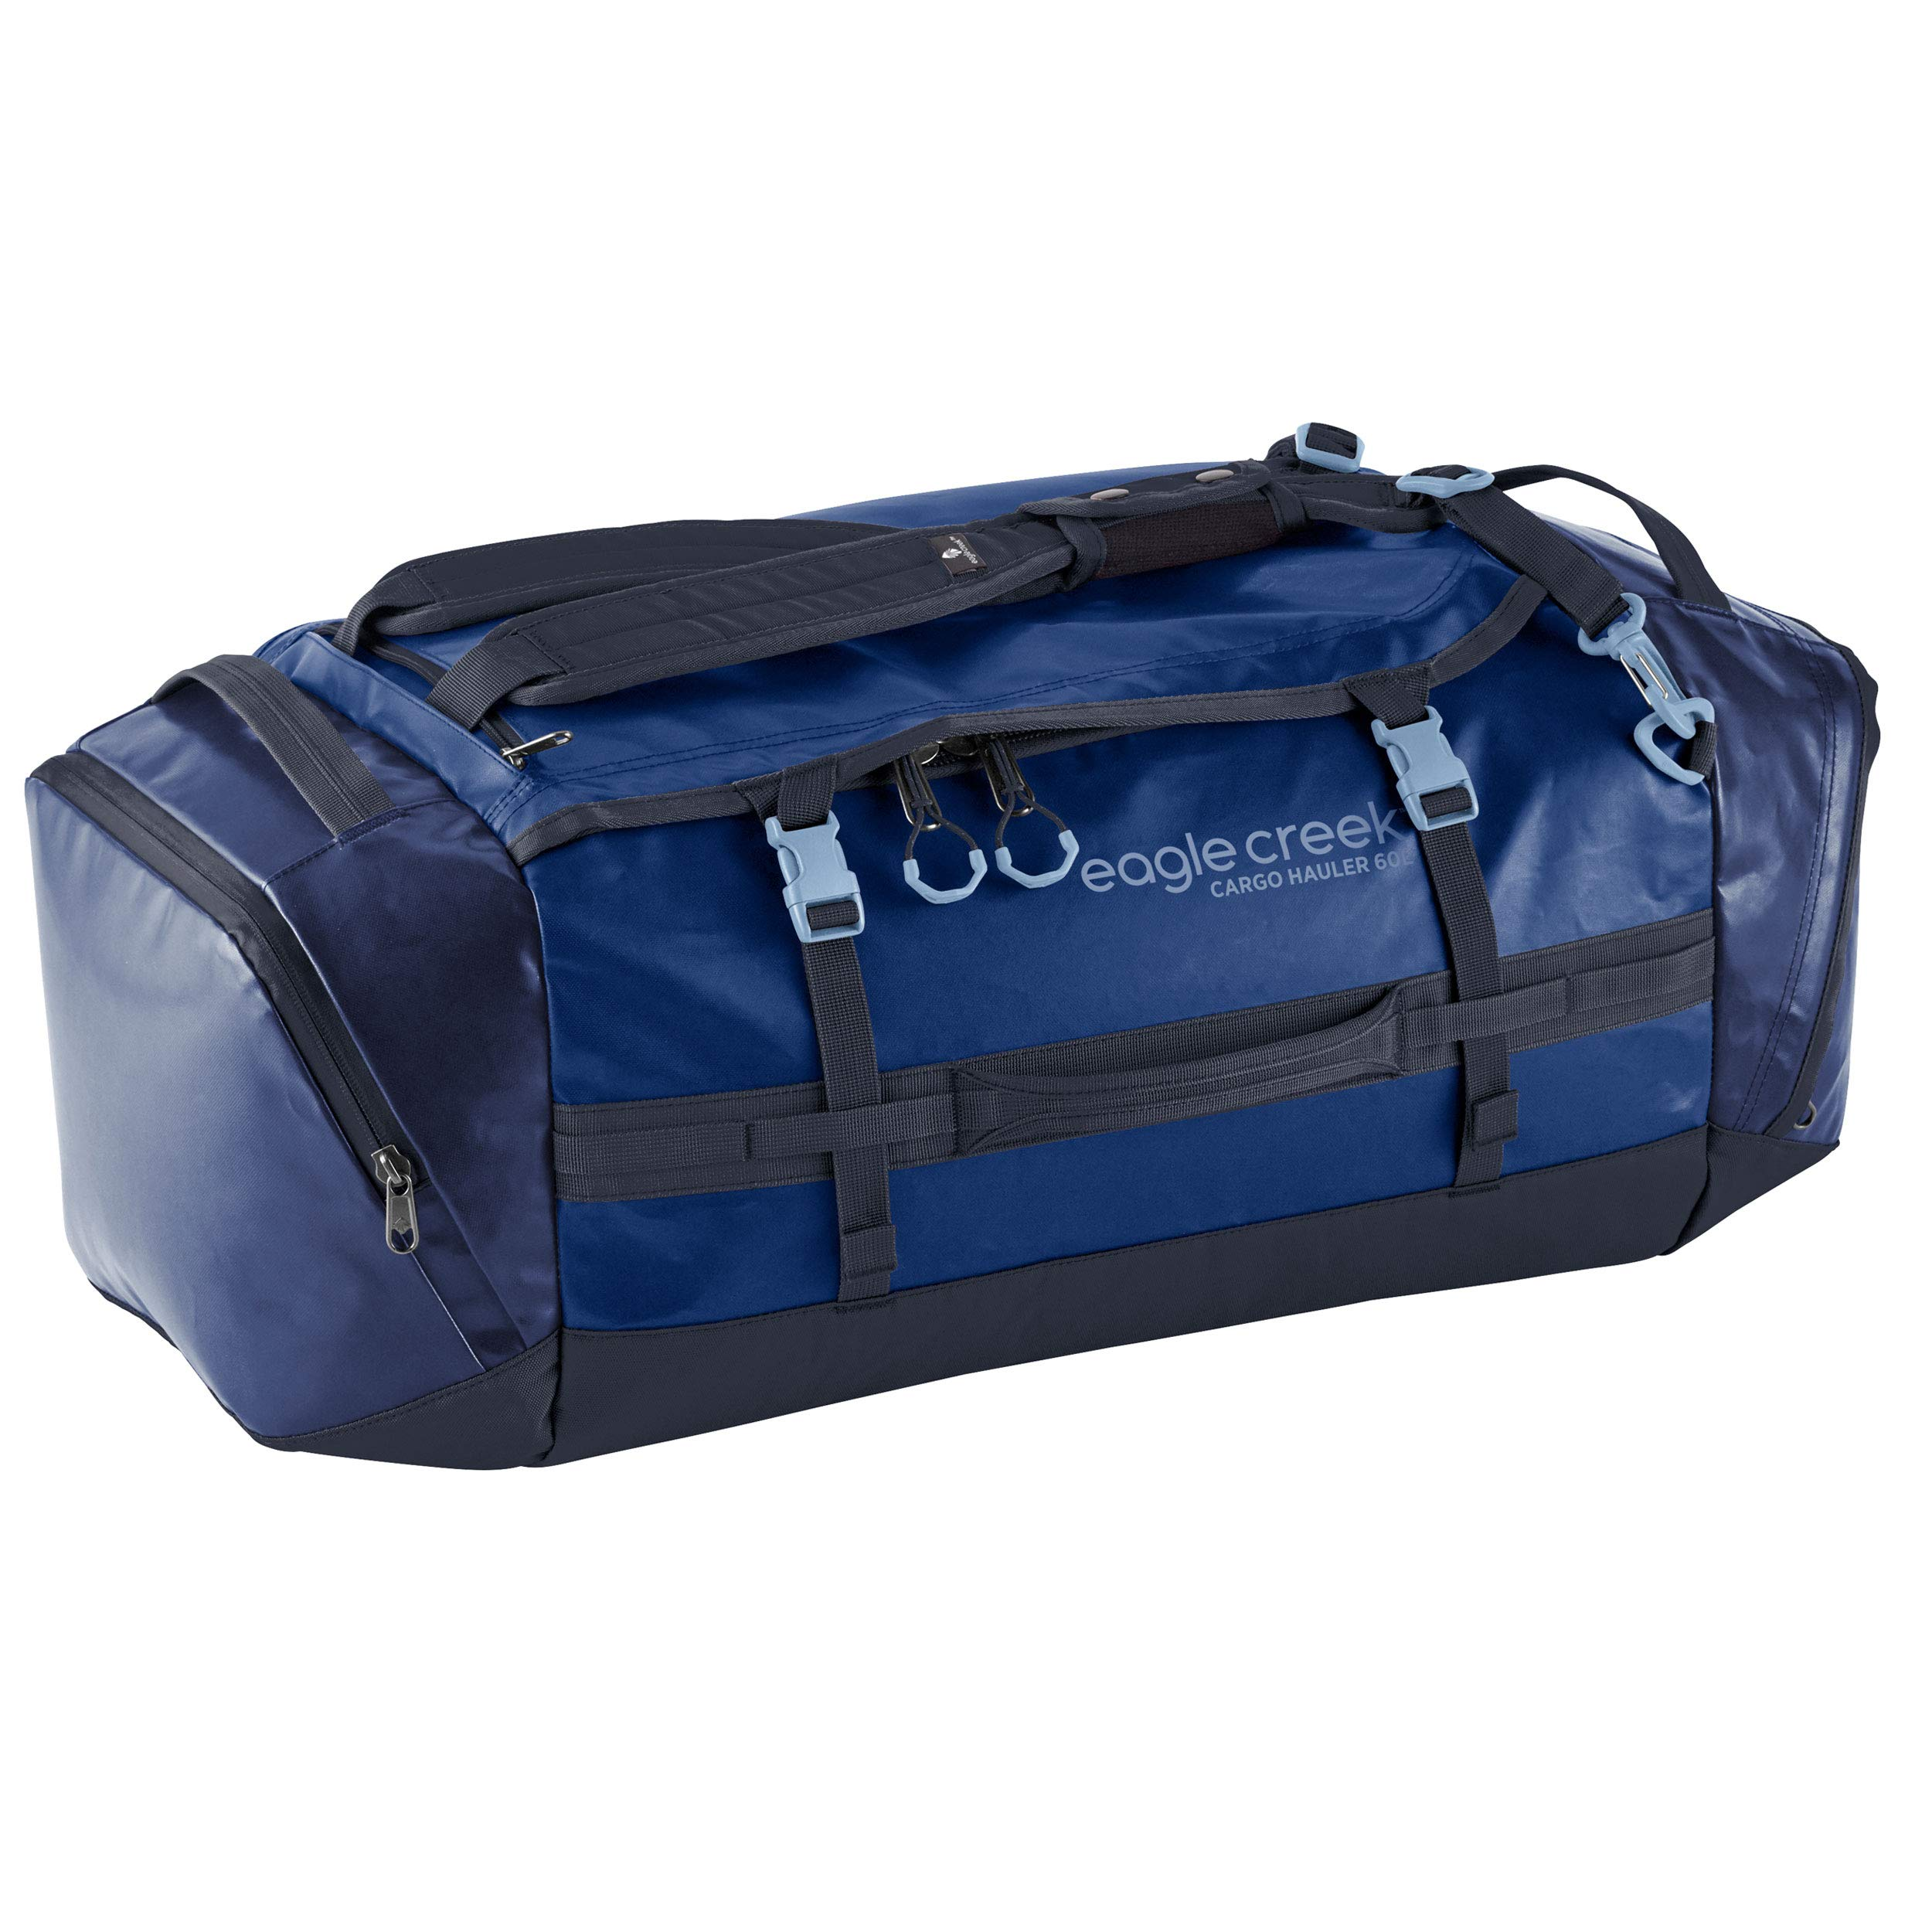 Eagle Creek Unisex-Adult's Cargo Hauler Backpack Duffel Bag, Arctic Blue, 60L, Artic by Eagle Creek